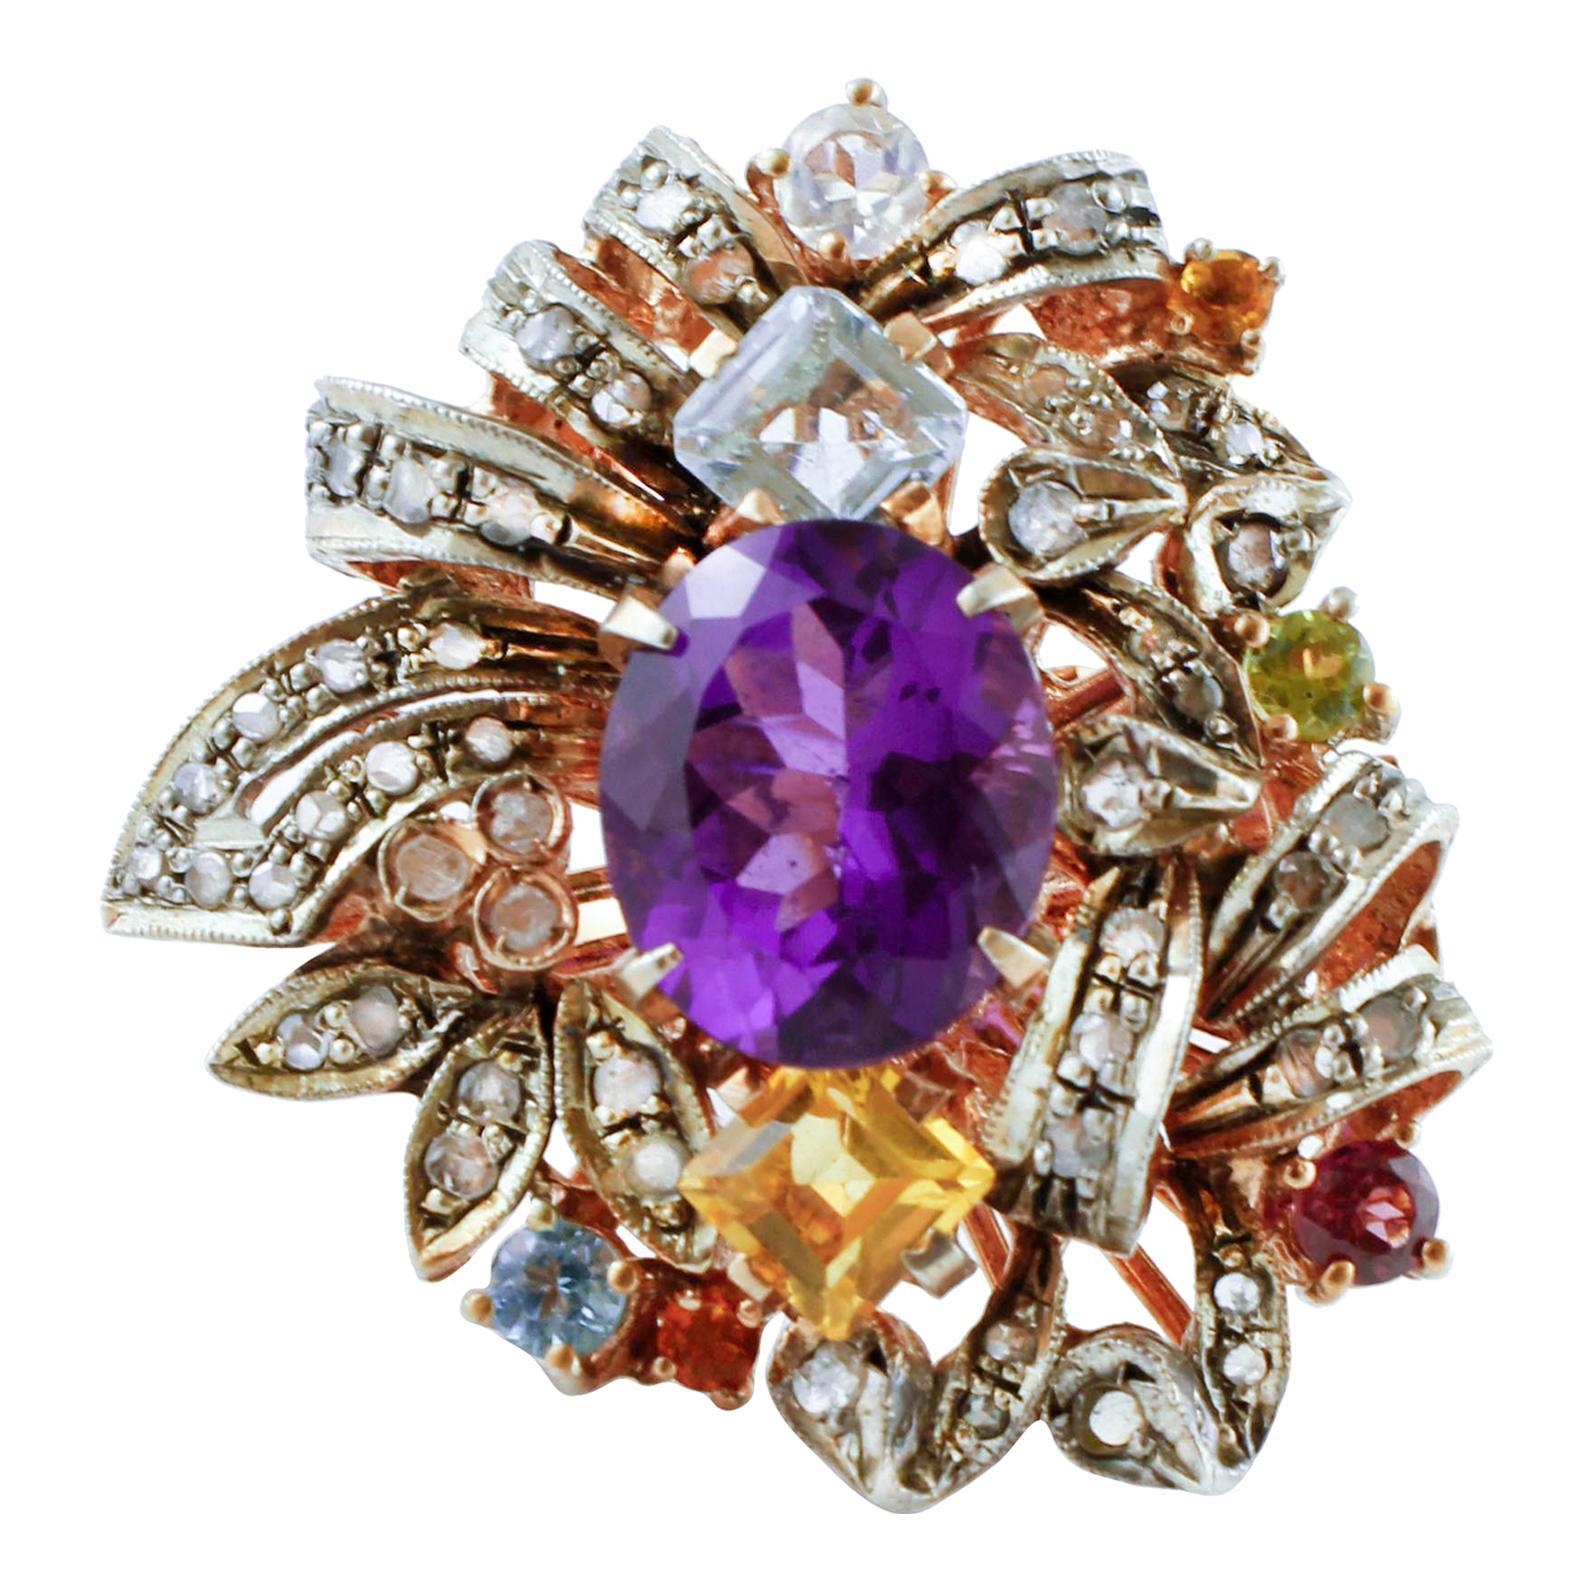 Diamonds, Amethyst, Peridot, Garnet, Aquamarines, Topaz, 9K Gold and Silver Ring